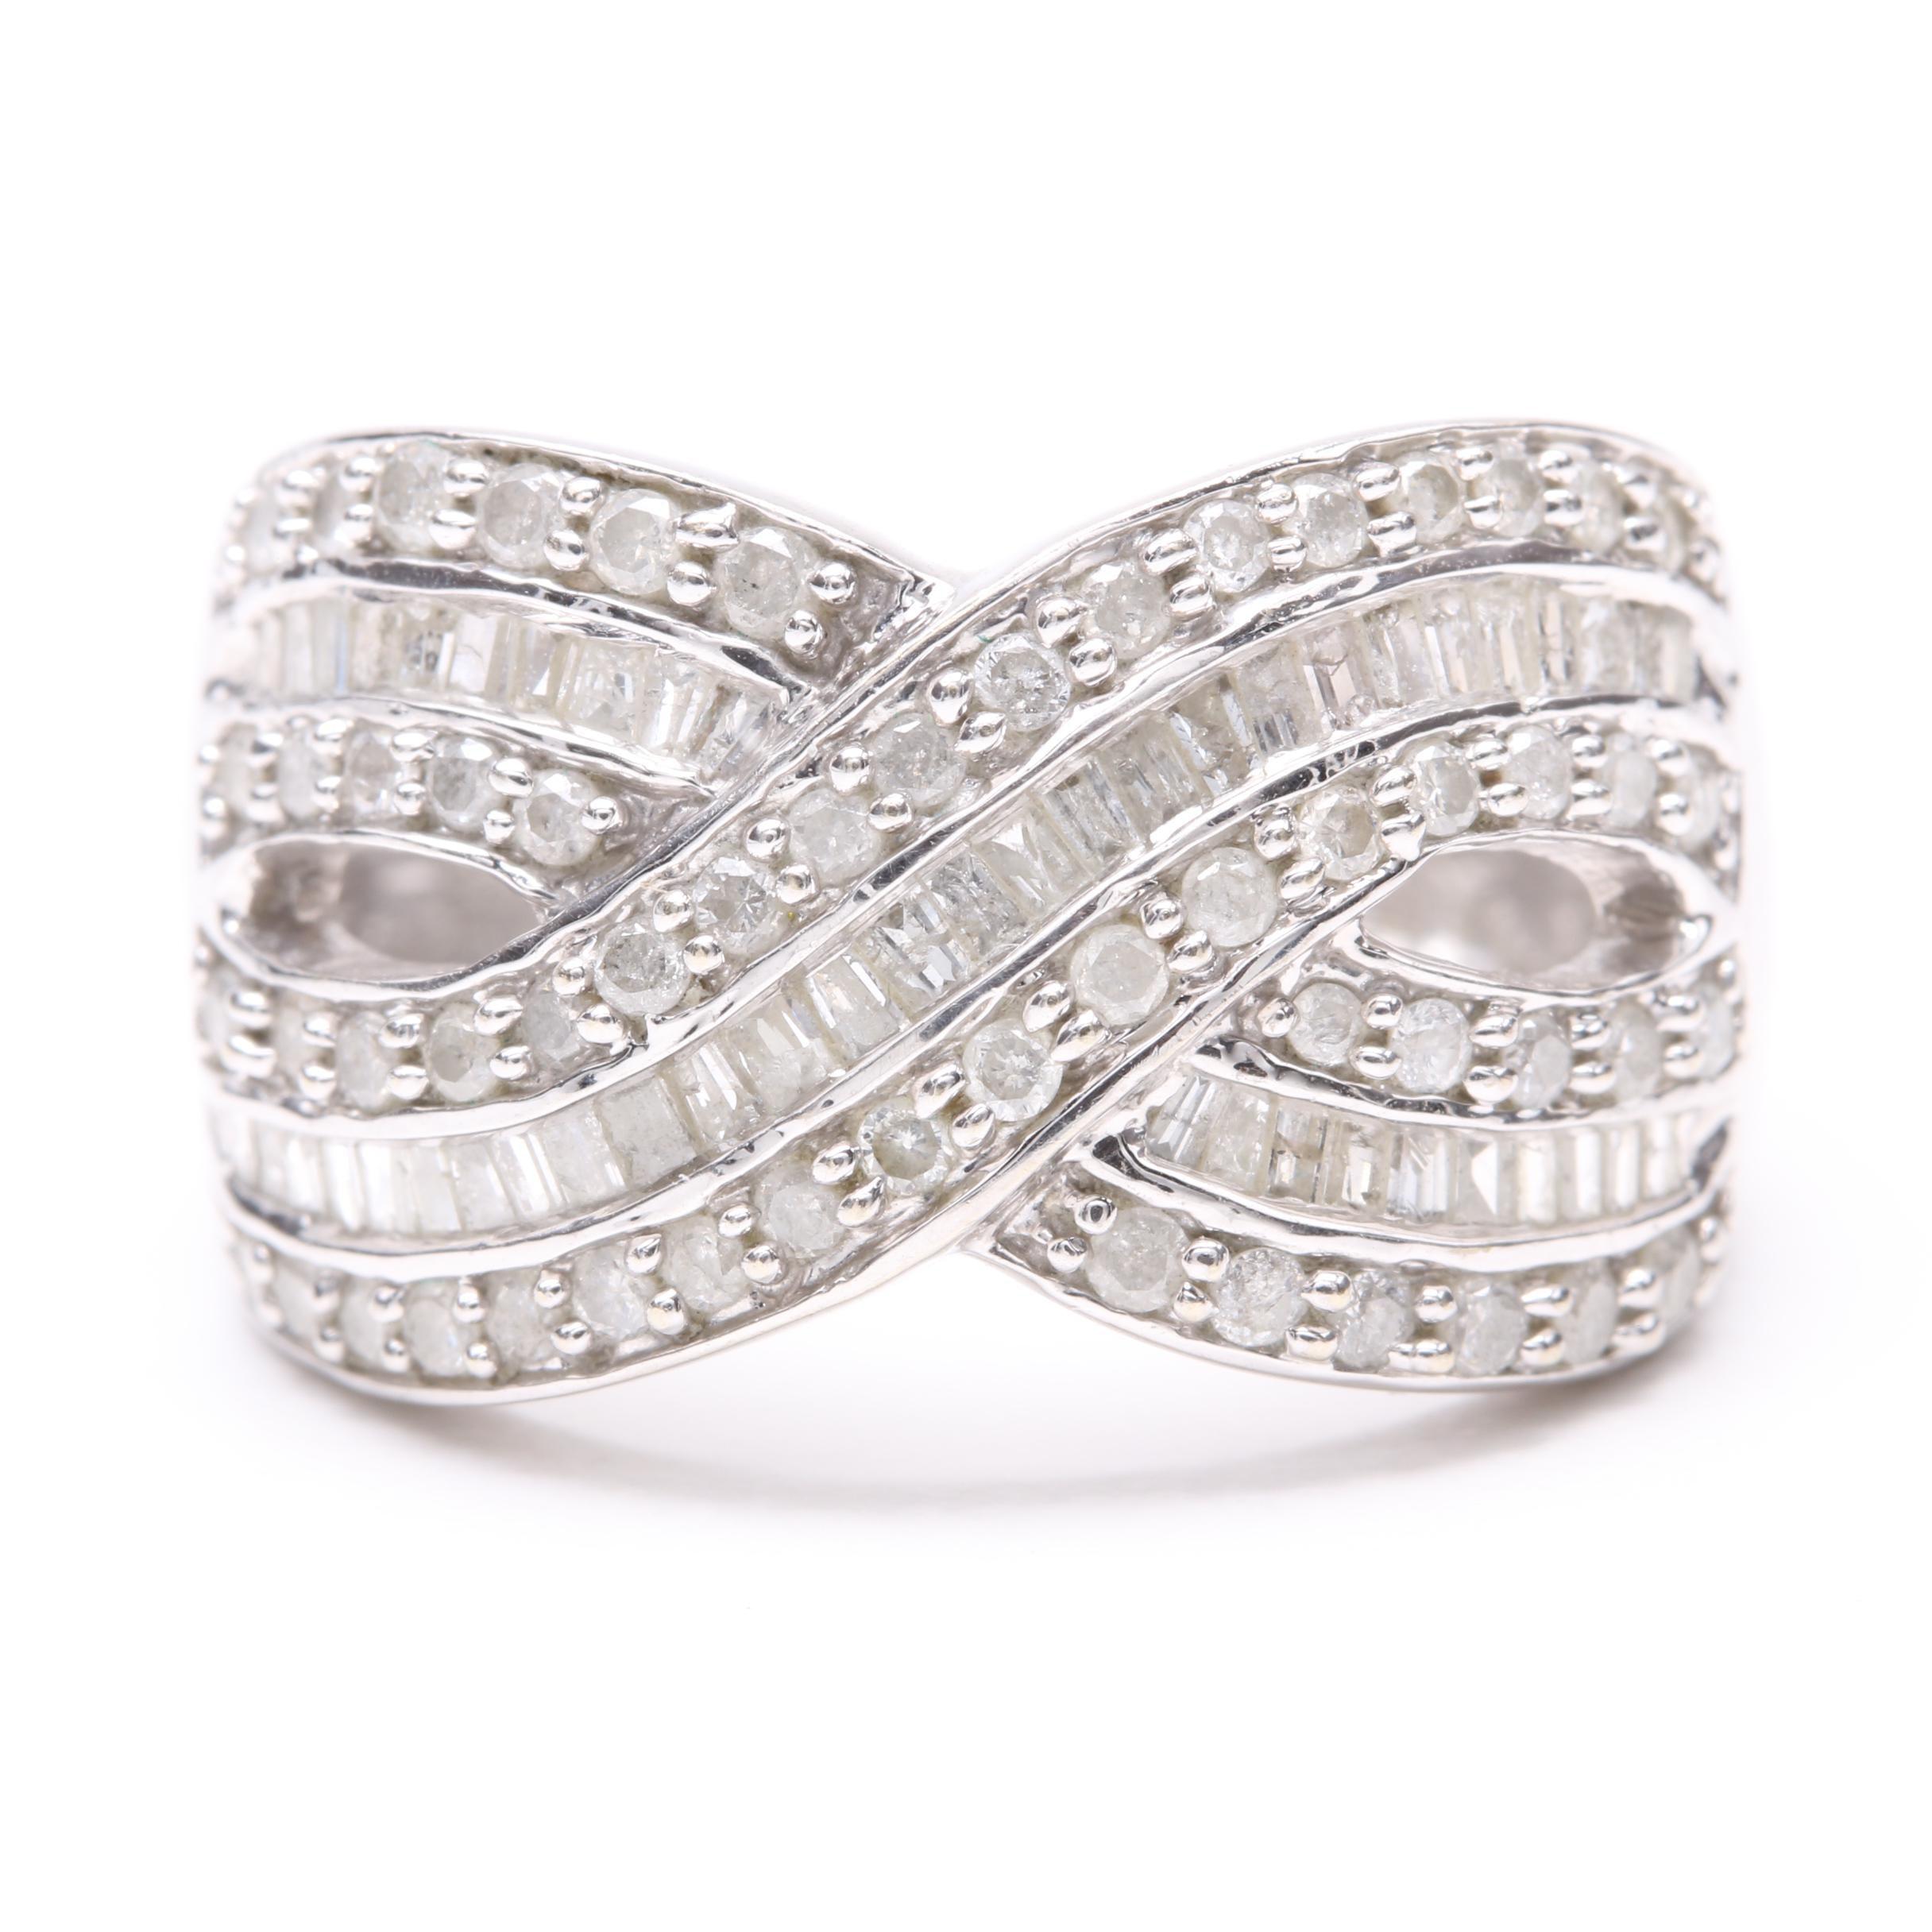 10K White Gold 1.14 CTW Diamond Ring